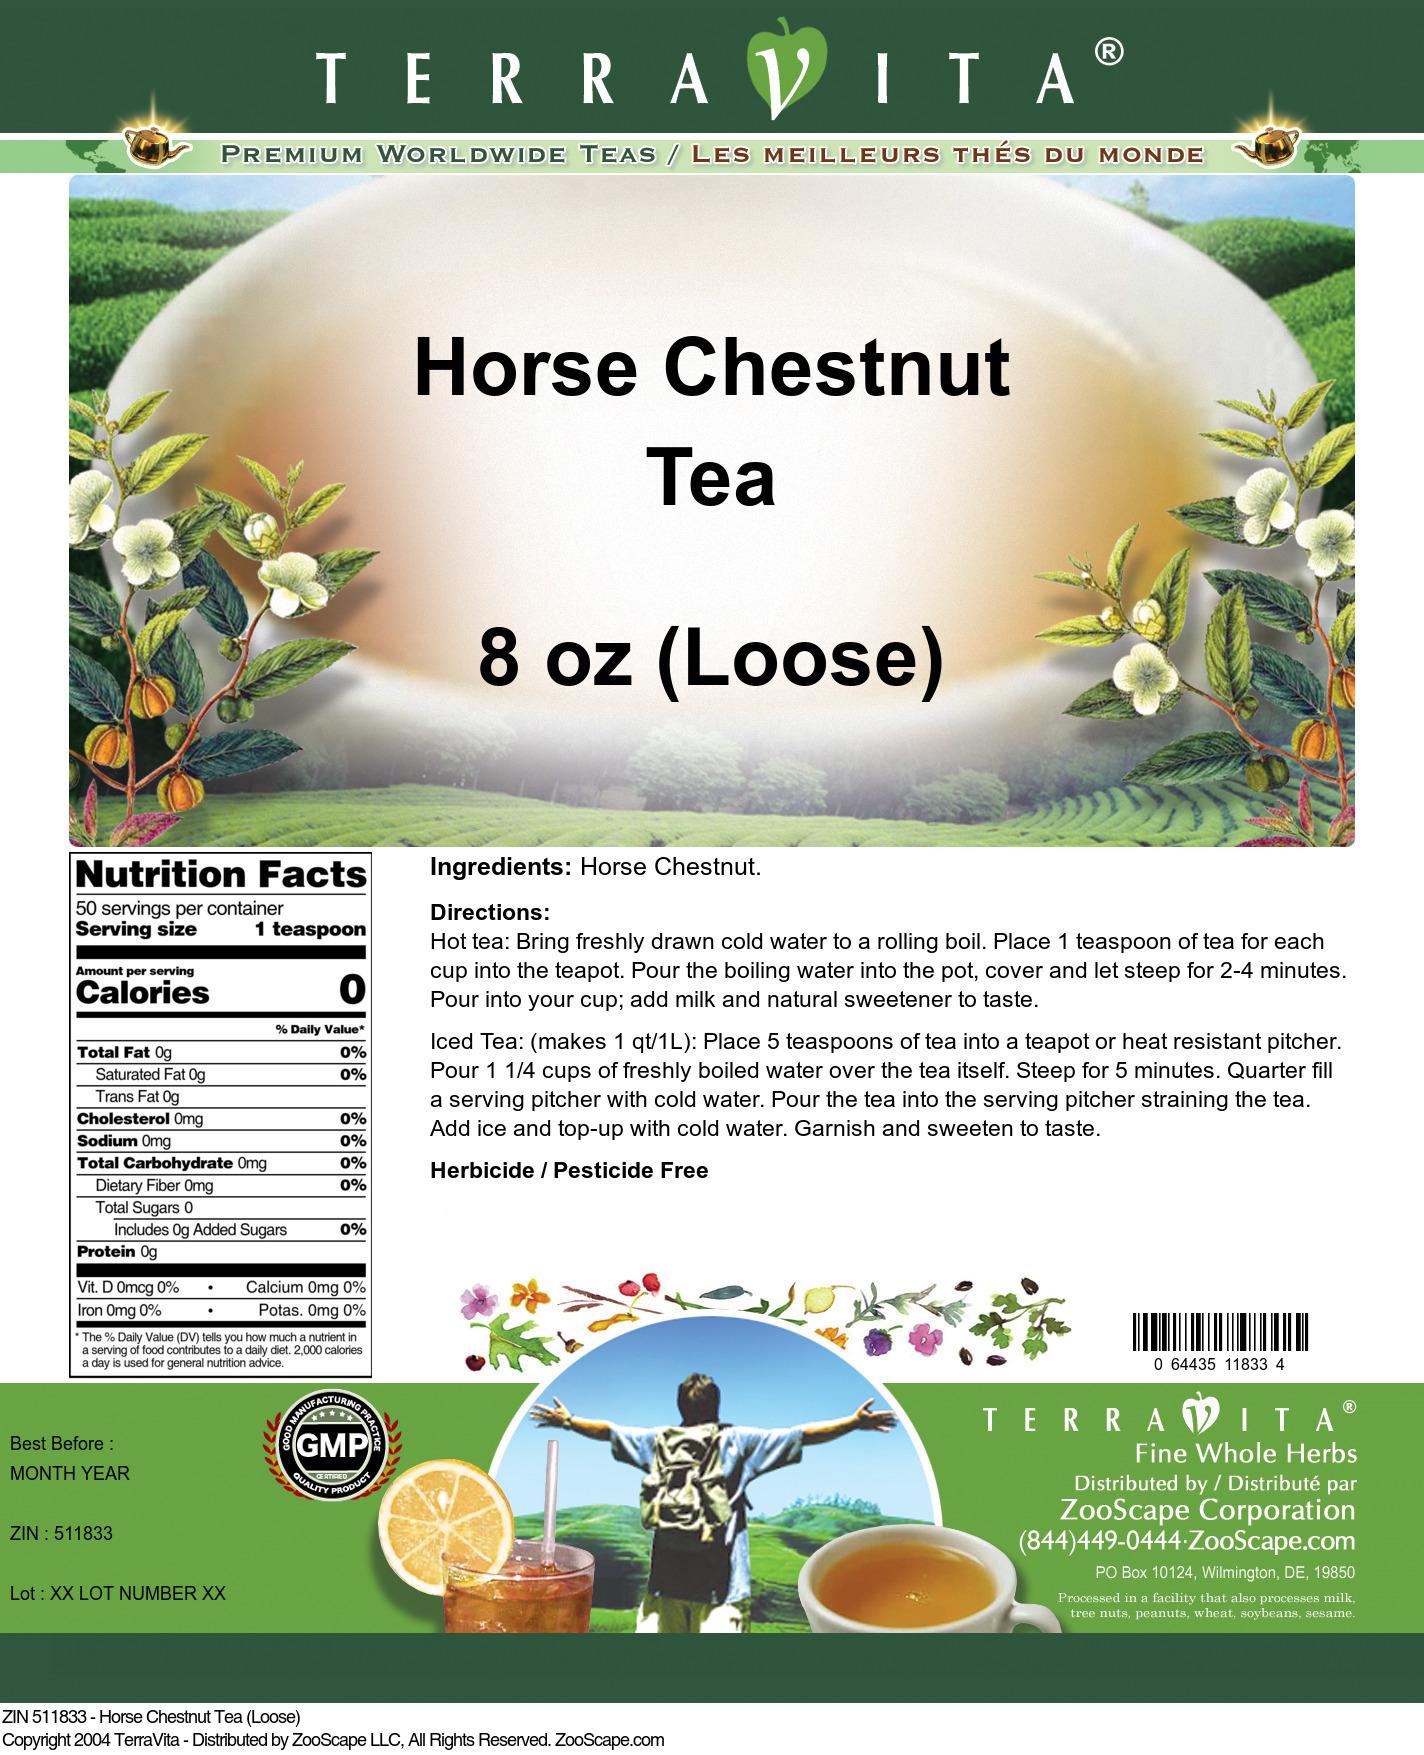 Horse Chestnut Tea (Loose)